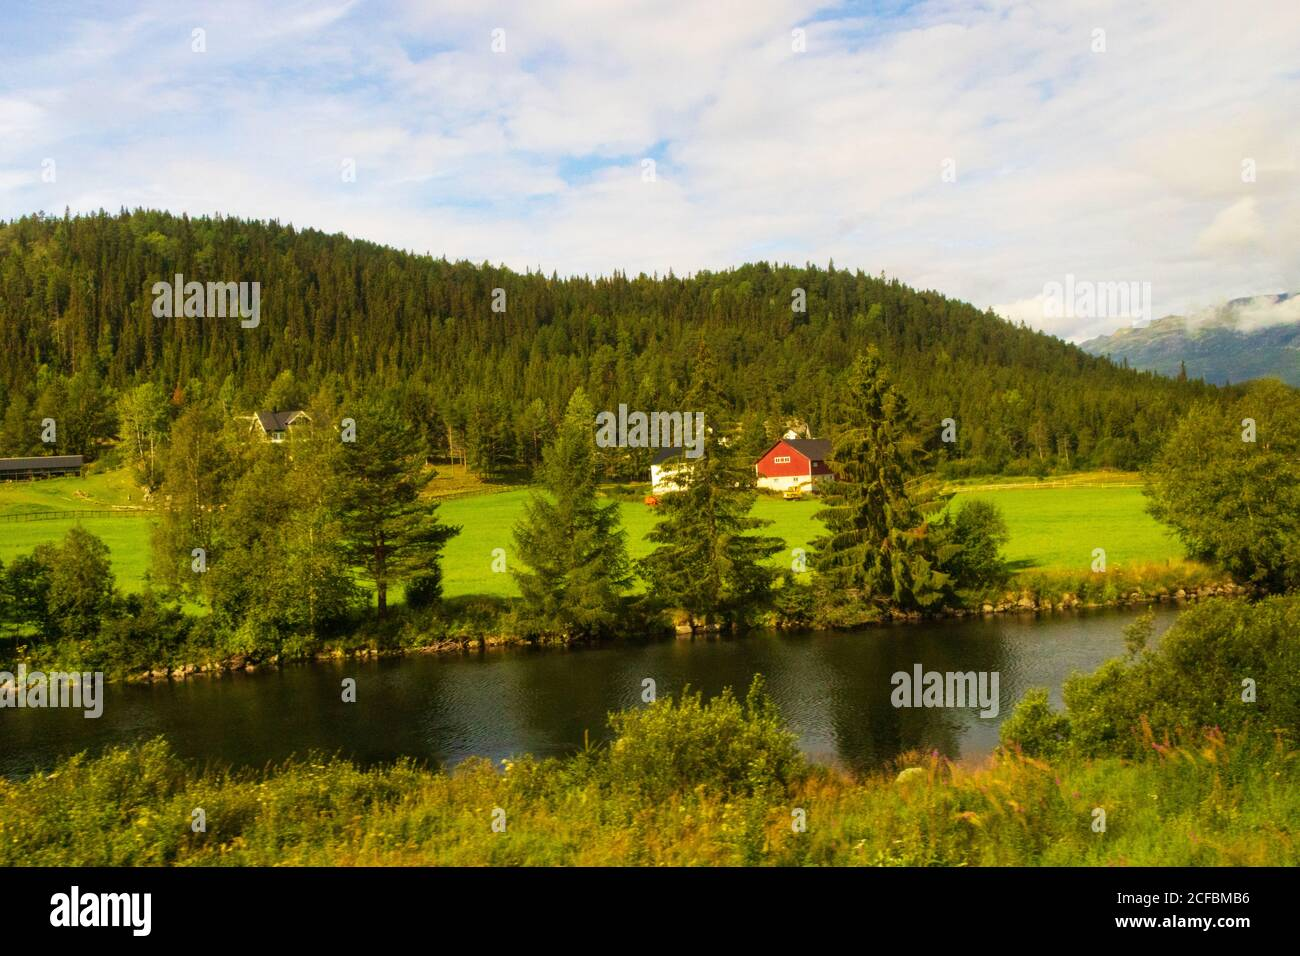 Summertime scenery,lush greenery,beautiful landscape,Storåne river Innlandet county.Tyinvegen Vang,Norway seeen from route European route E16 Stock Photo